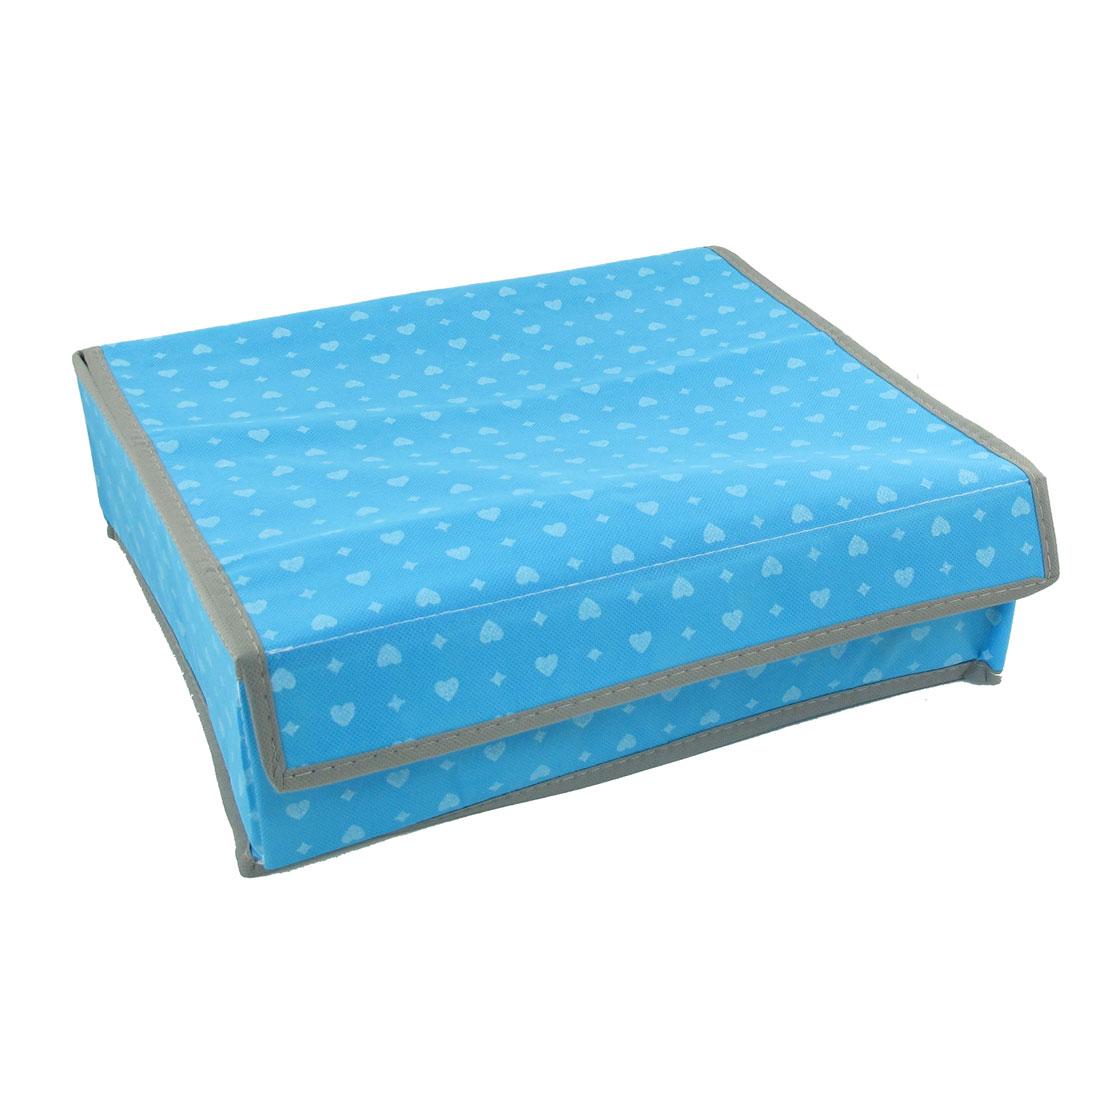 Heart Pattern 16 Compartments Folded Bra Underwear Socks Storage Box Case Blue